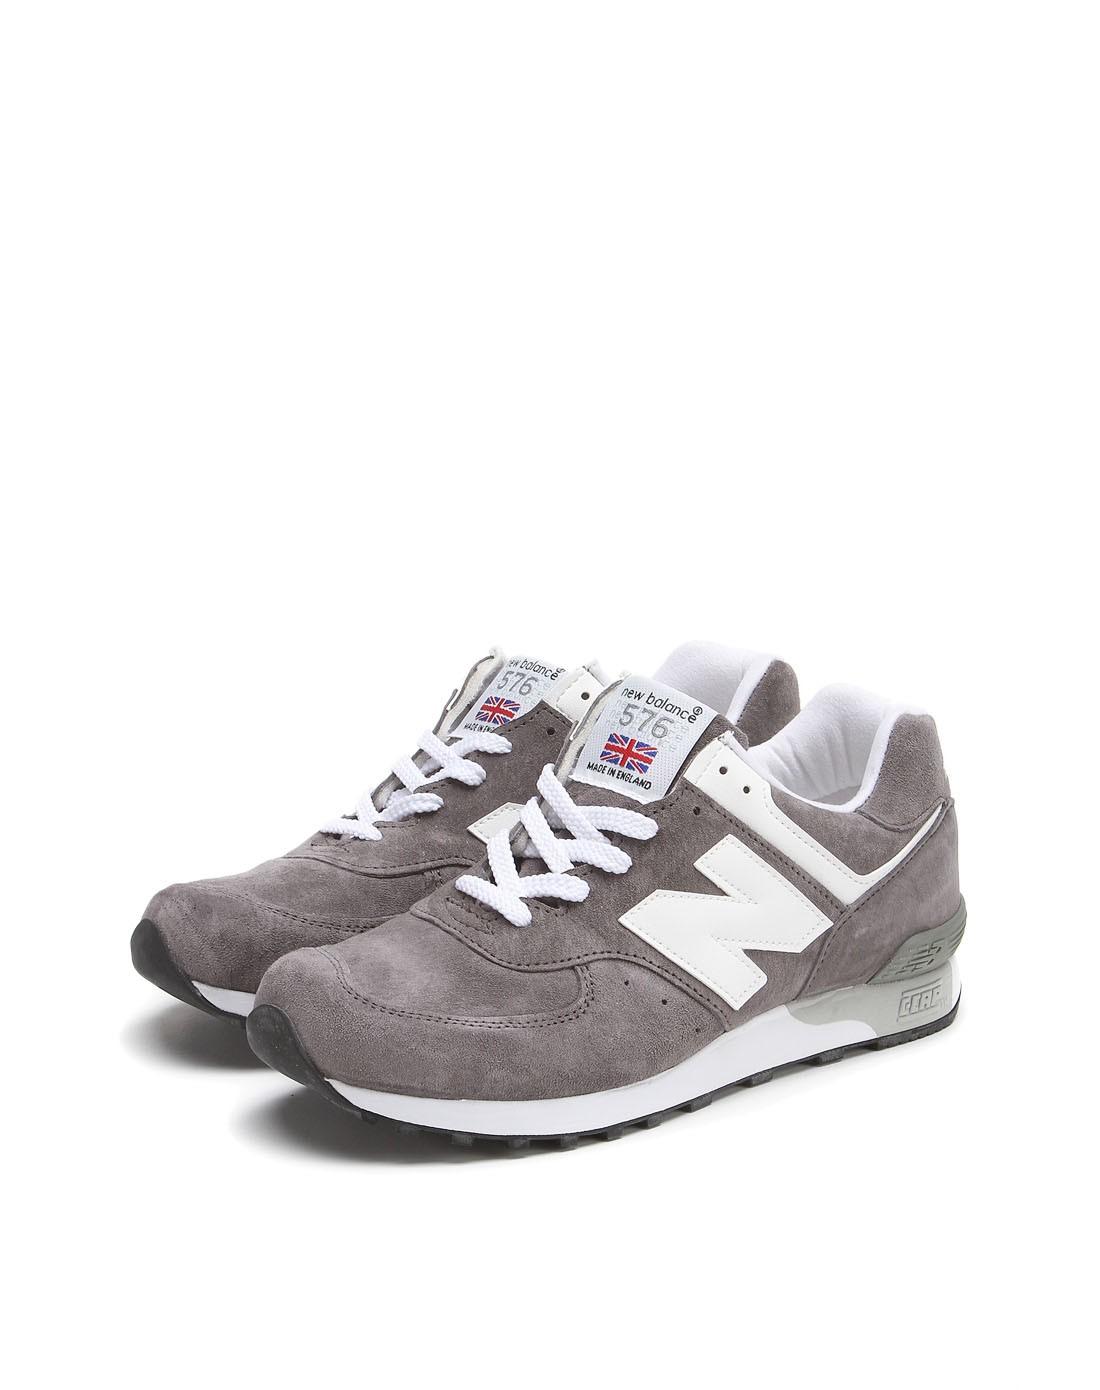 new balance男女鞋混合专场-男款深灰色英产nb576经典绒面复古跑鞋